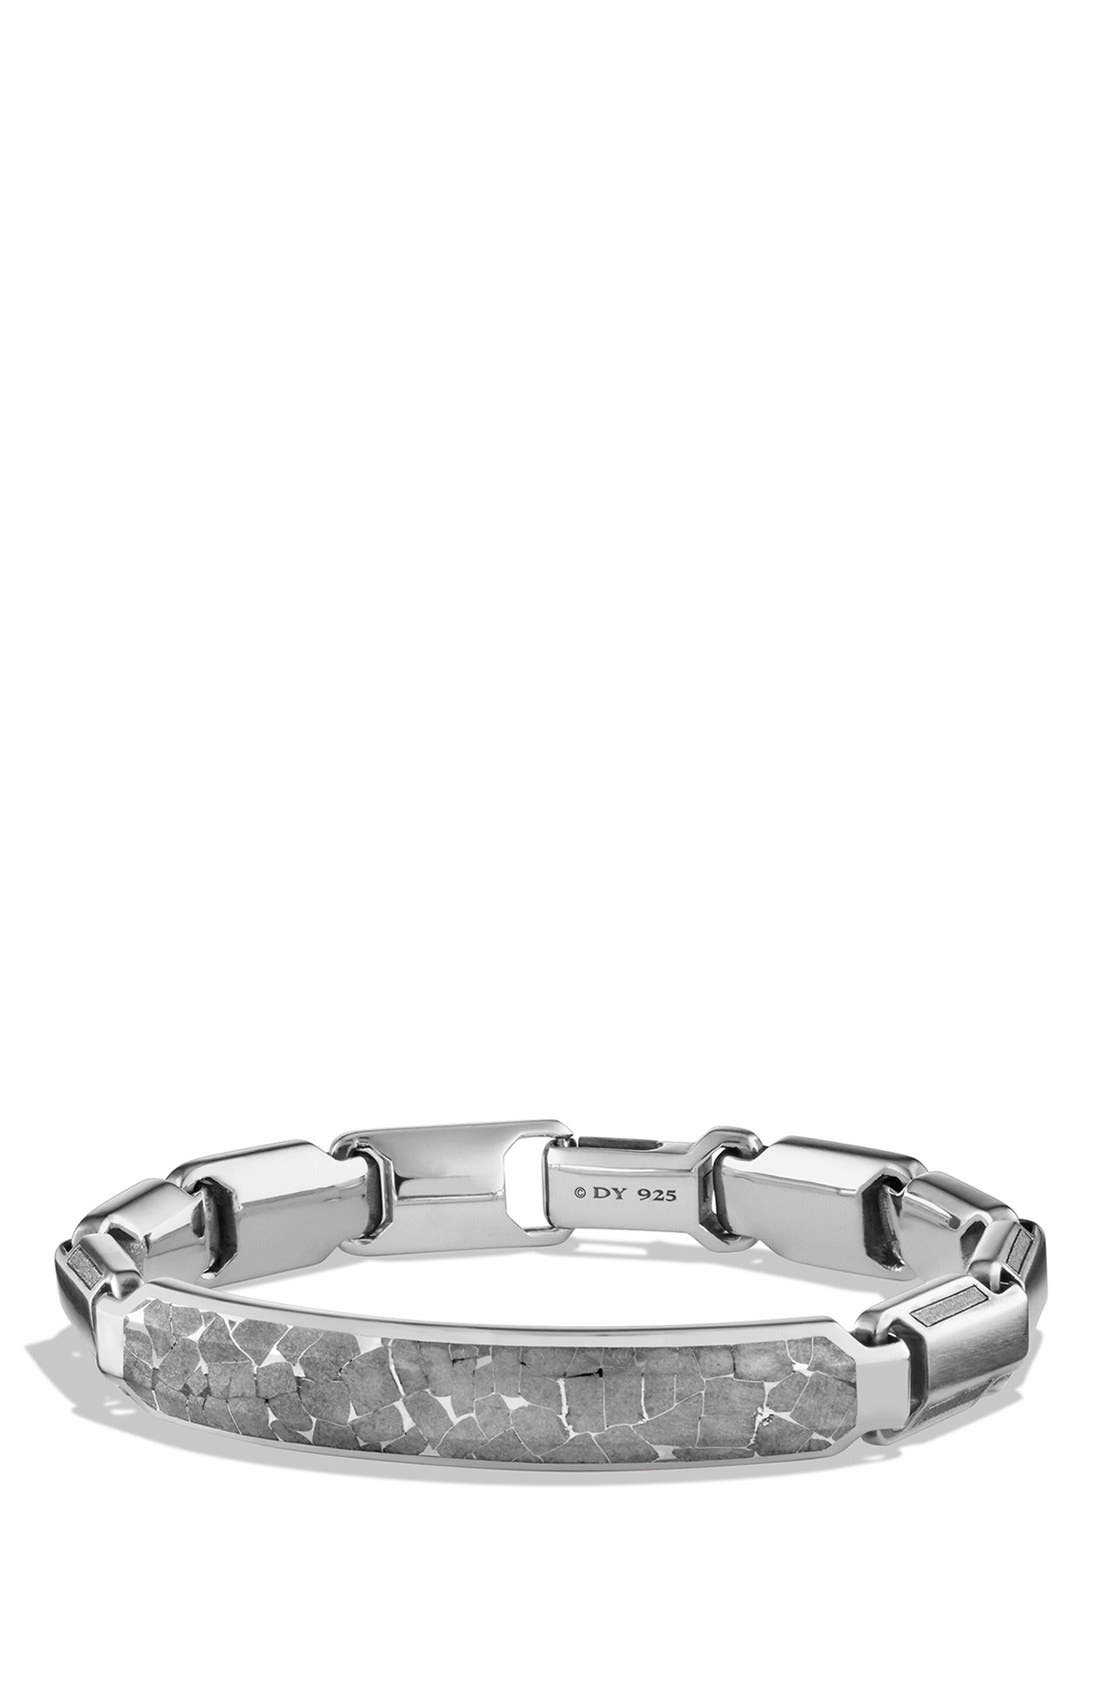 Alternate Image 1 Selected - David Yurman 'Meteorite' Fused ID Bracelet